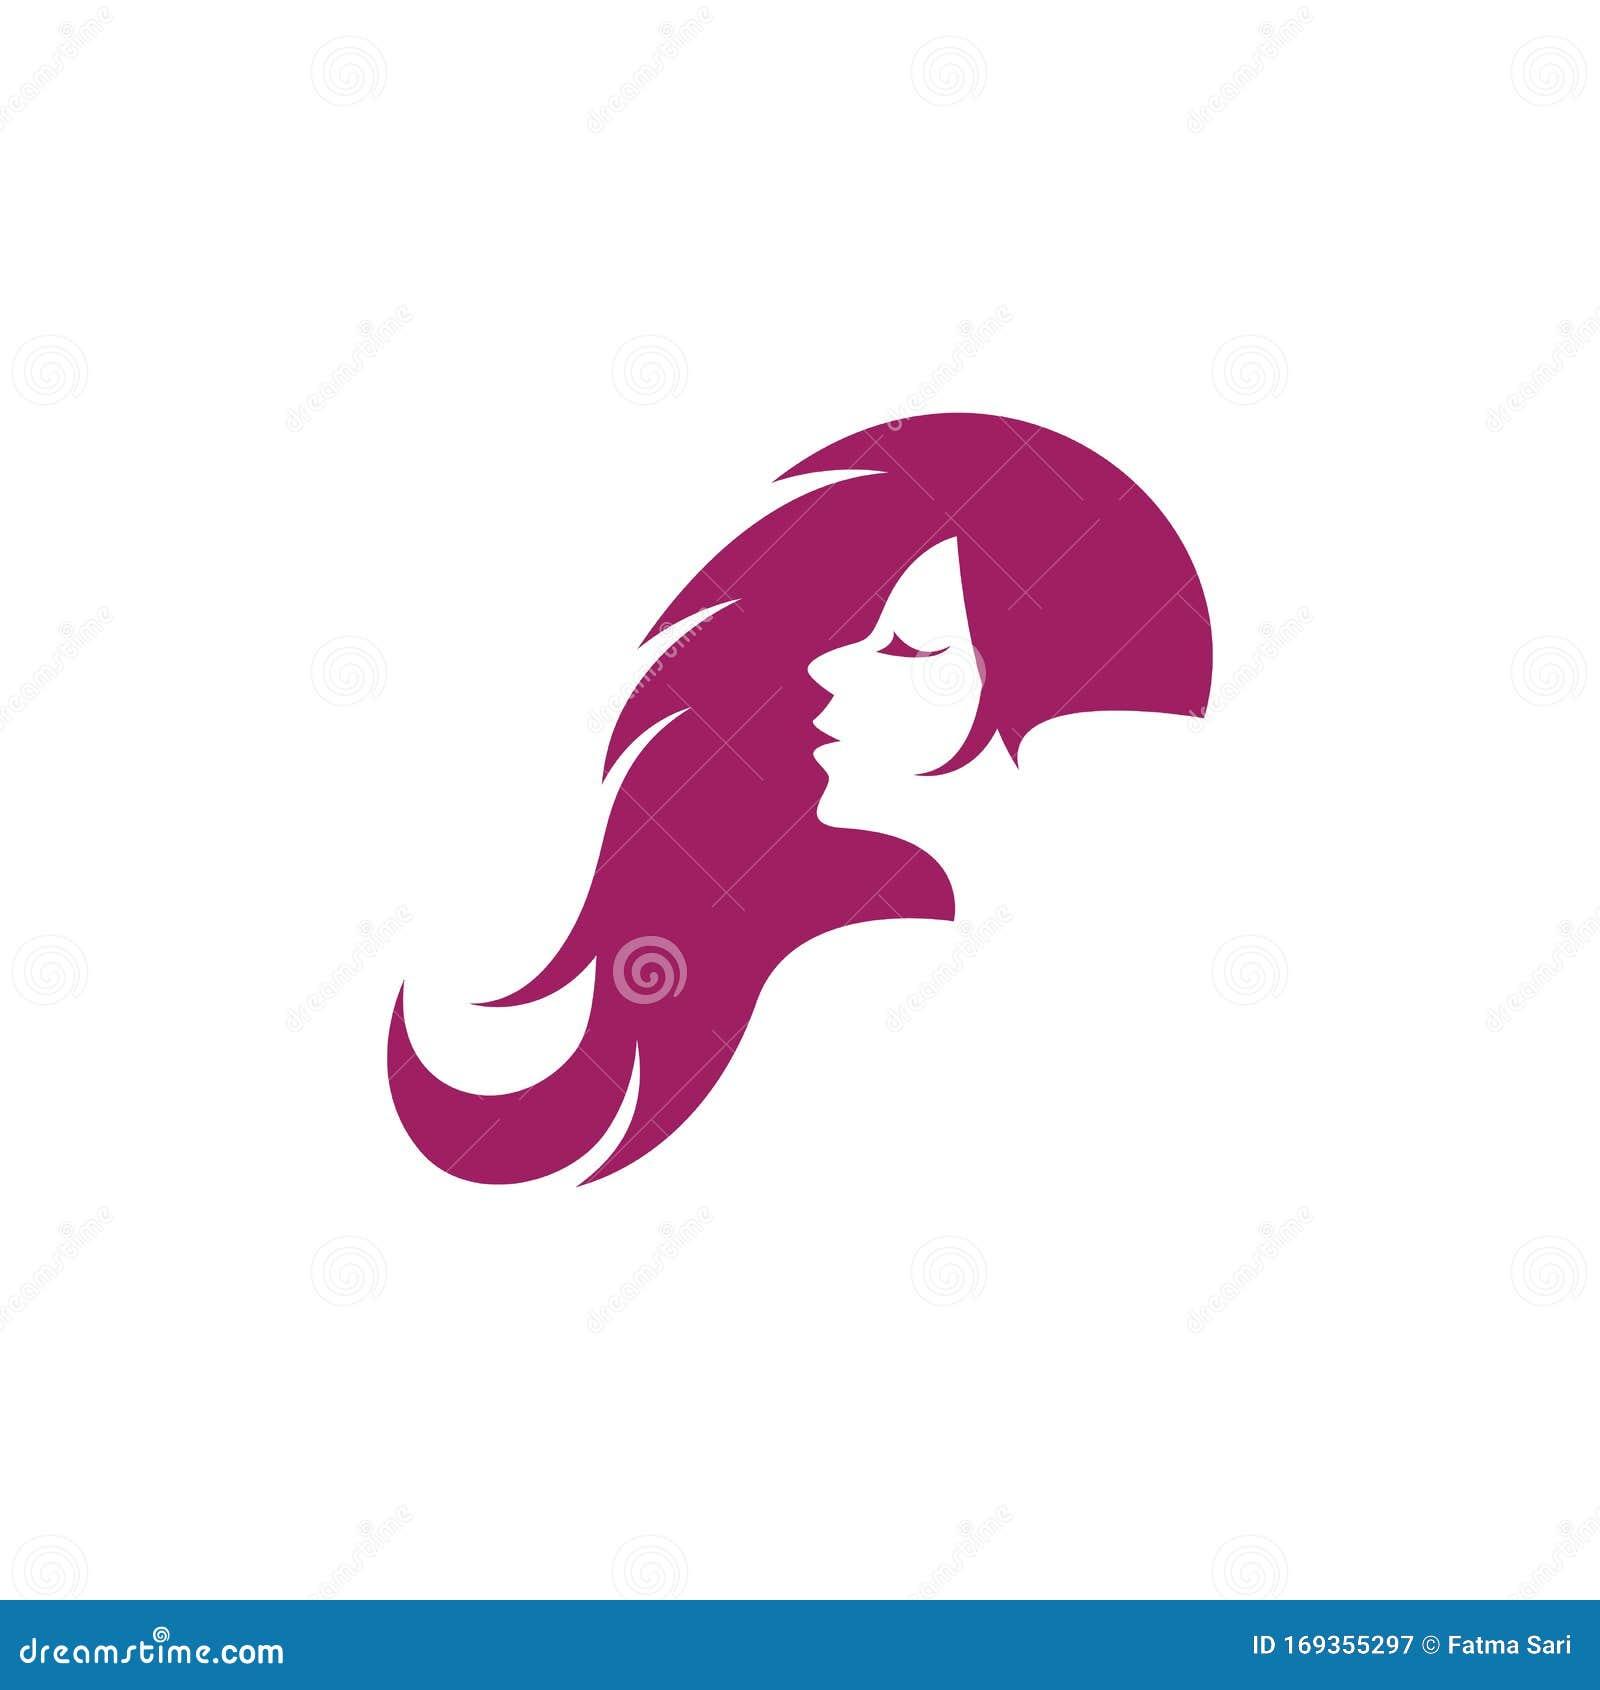 Black Hair Salon Logo Stock Illustrations 12 440 Black Hair Salon Logo Stock Illustrations Vectors Clipart Dreamstime